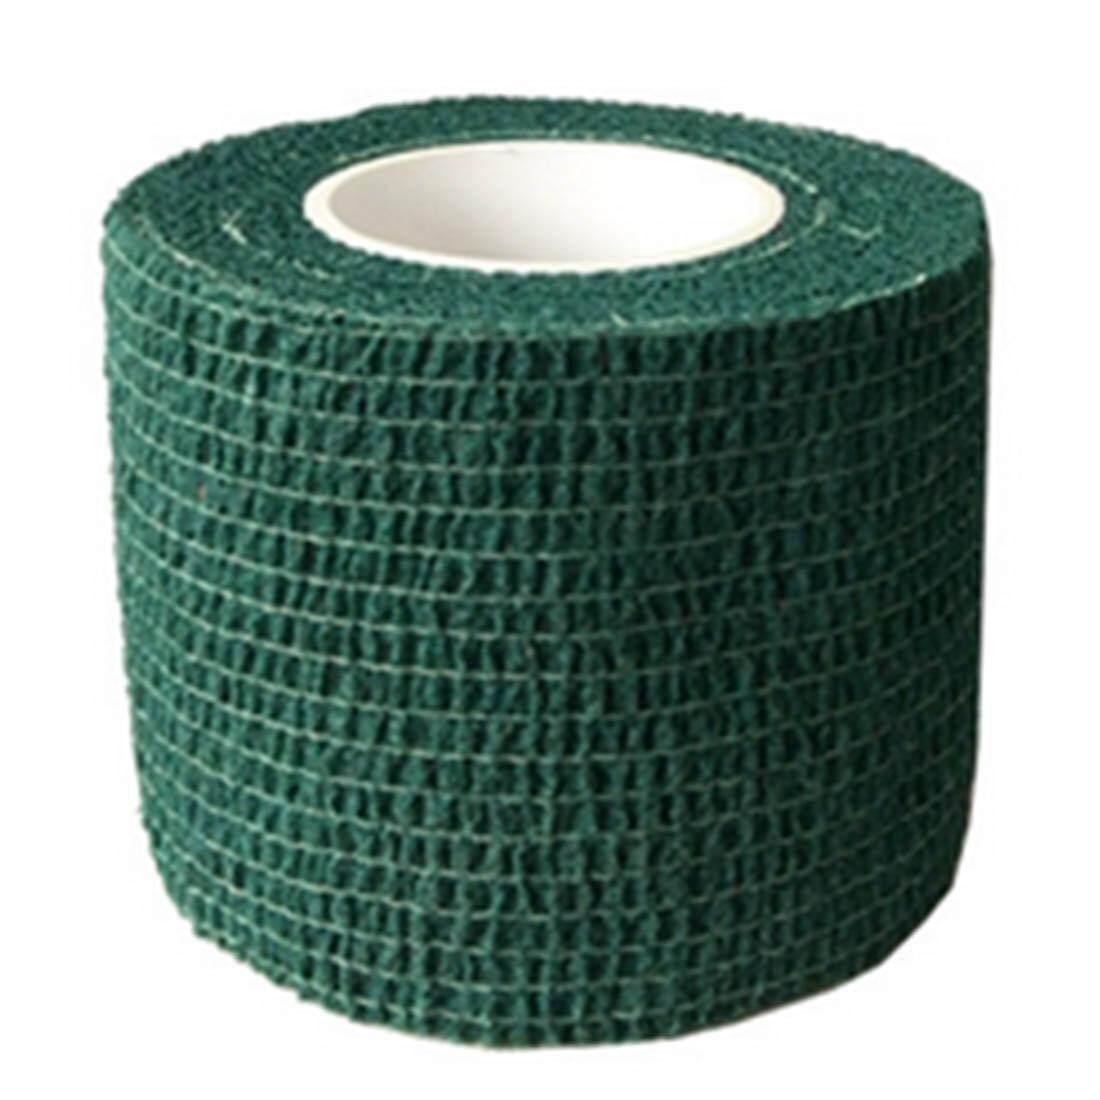 360 Wish ผ้าไม่ทอกีฬาแถบพันแบบติดแน่นเทปการแพทย์ยืดหยุ่นผ้าพันแผลชนิดกาว 7.5 เซนติเมตร * 4.5 เมตร - สีเขียวเข้ม By Wish360.